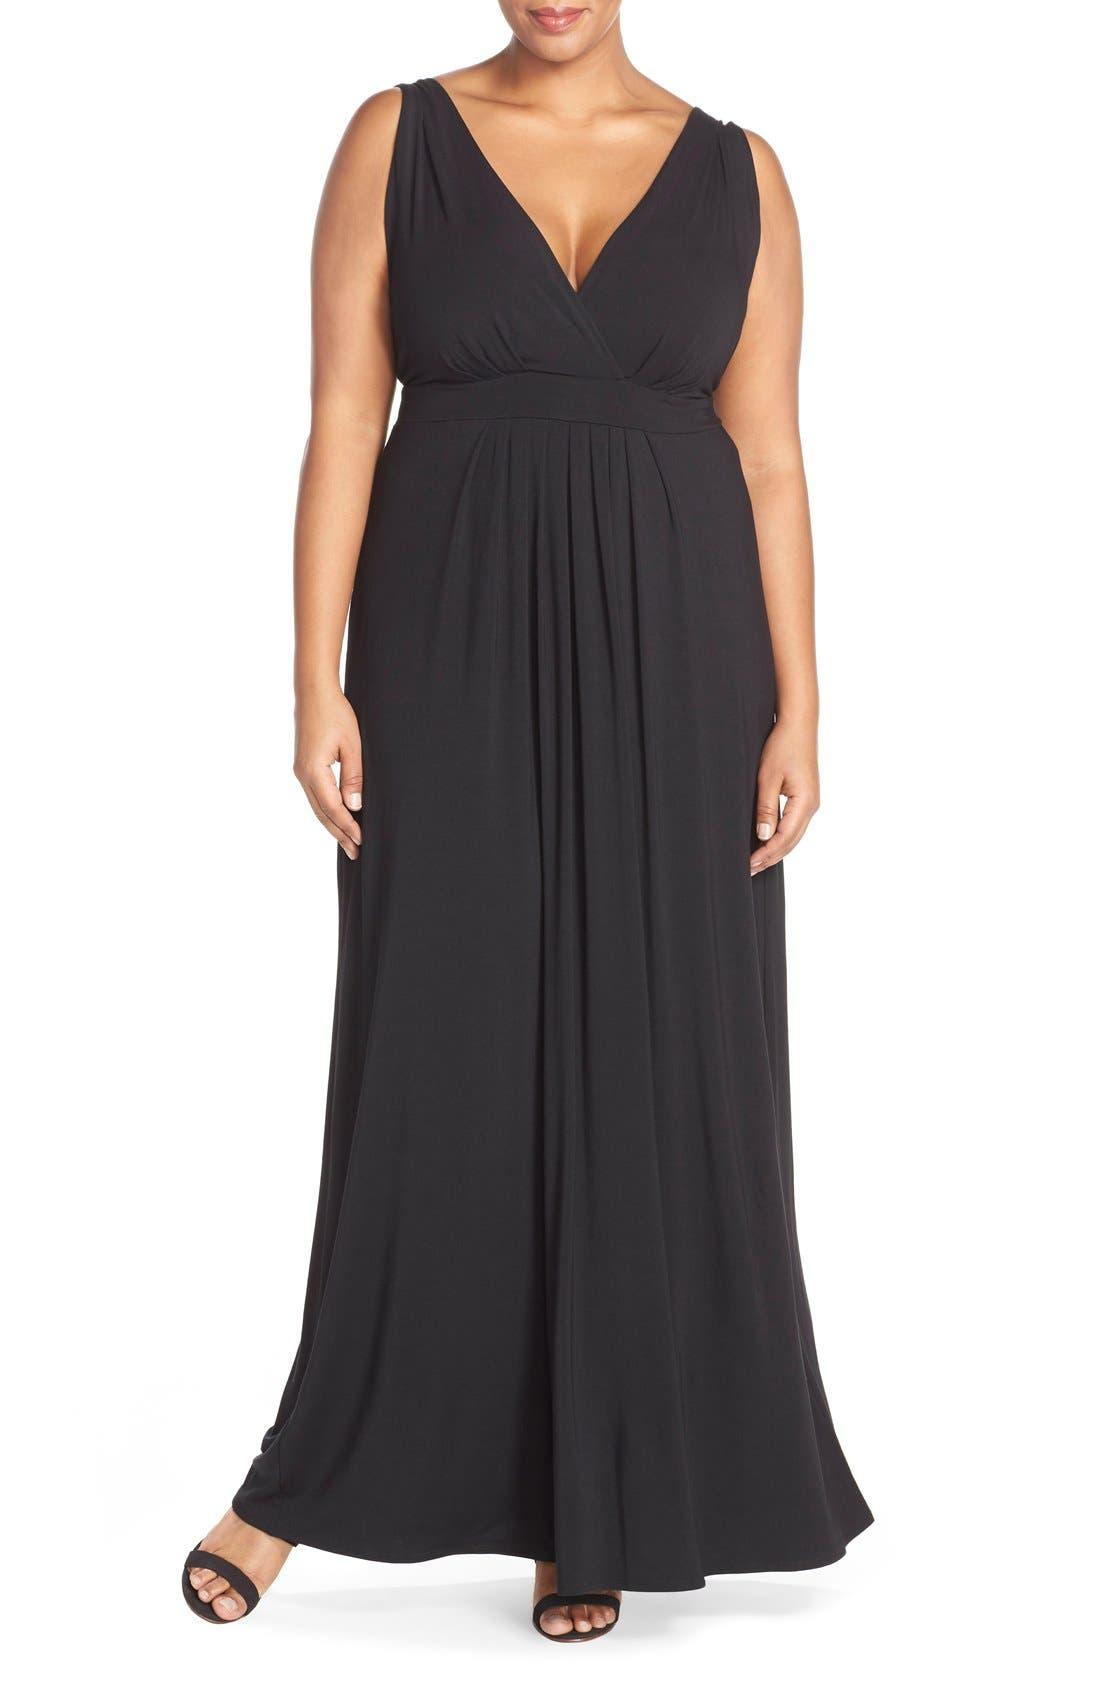 Chloe Empire Waist Maxi Dress,                             Main thumbnail 1, color,                             Black